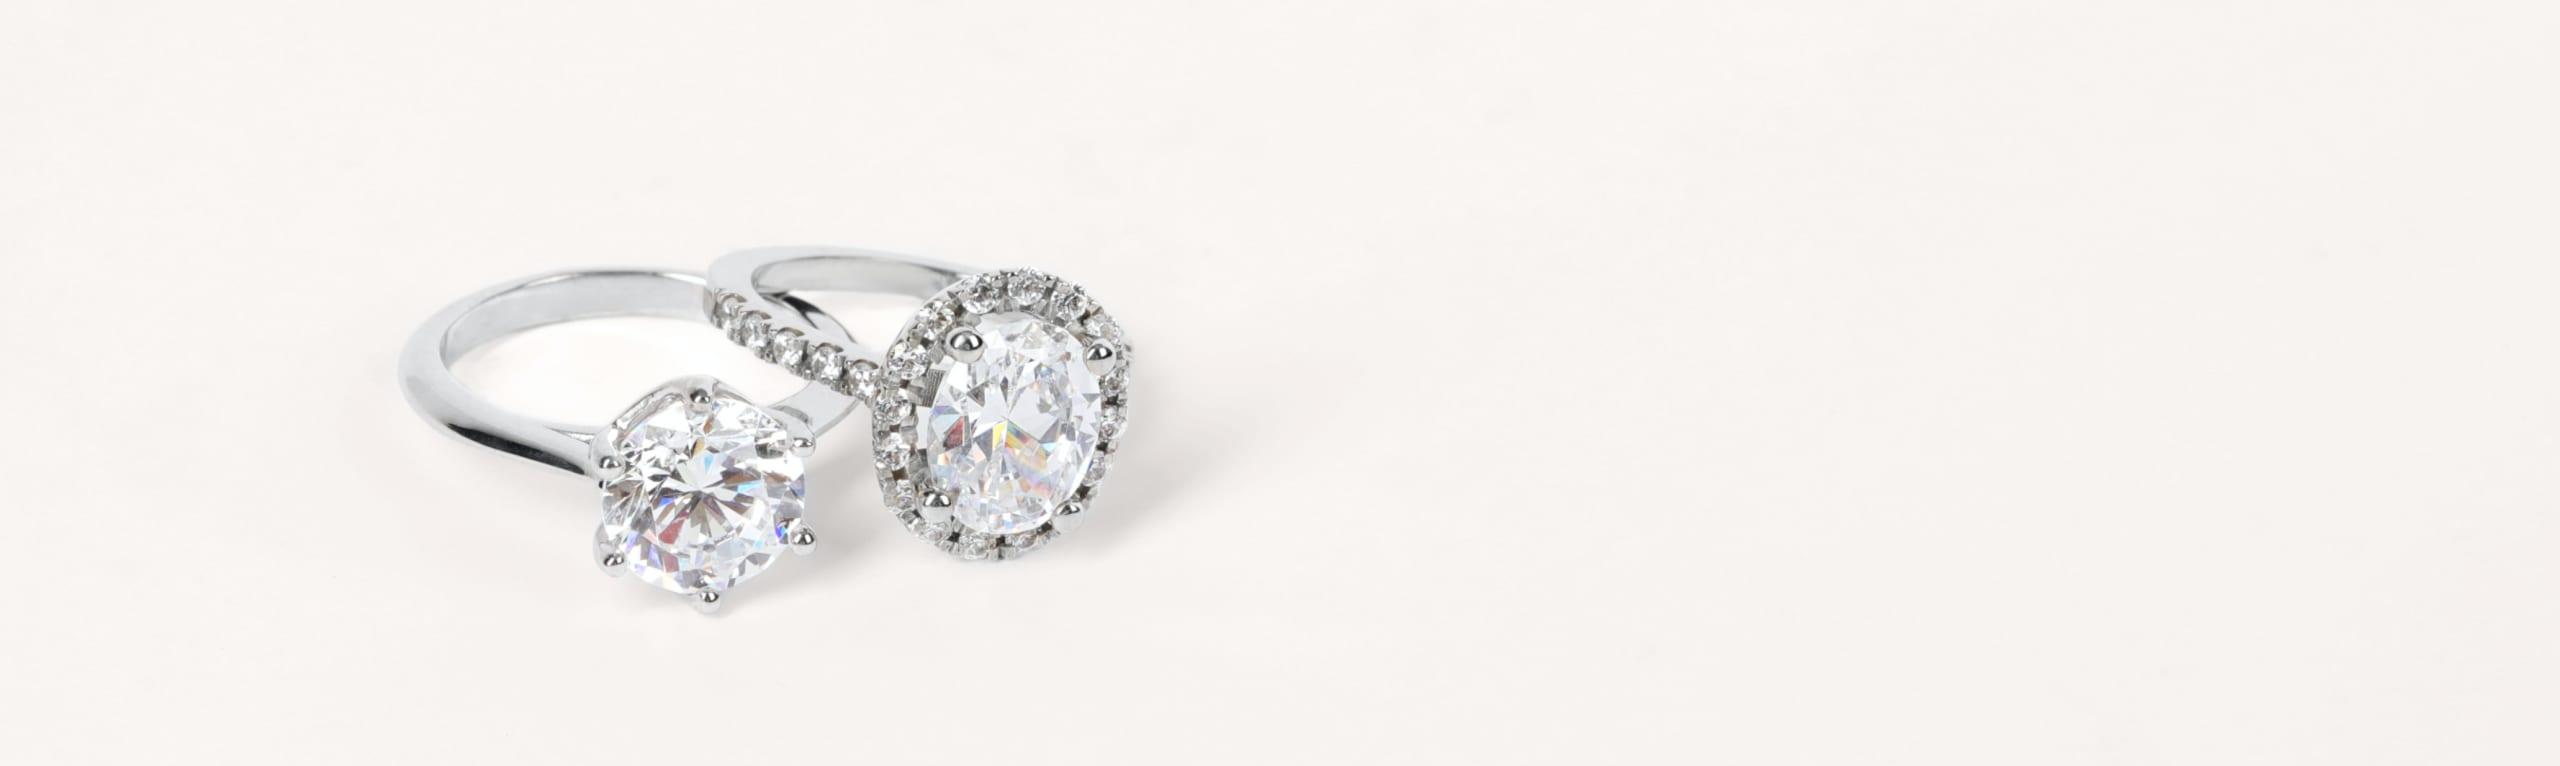 2+ Carat Engagement Rings